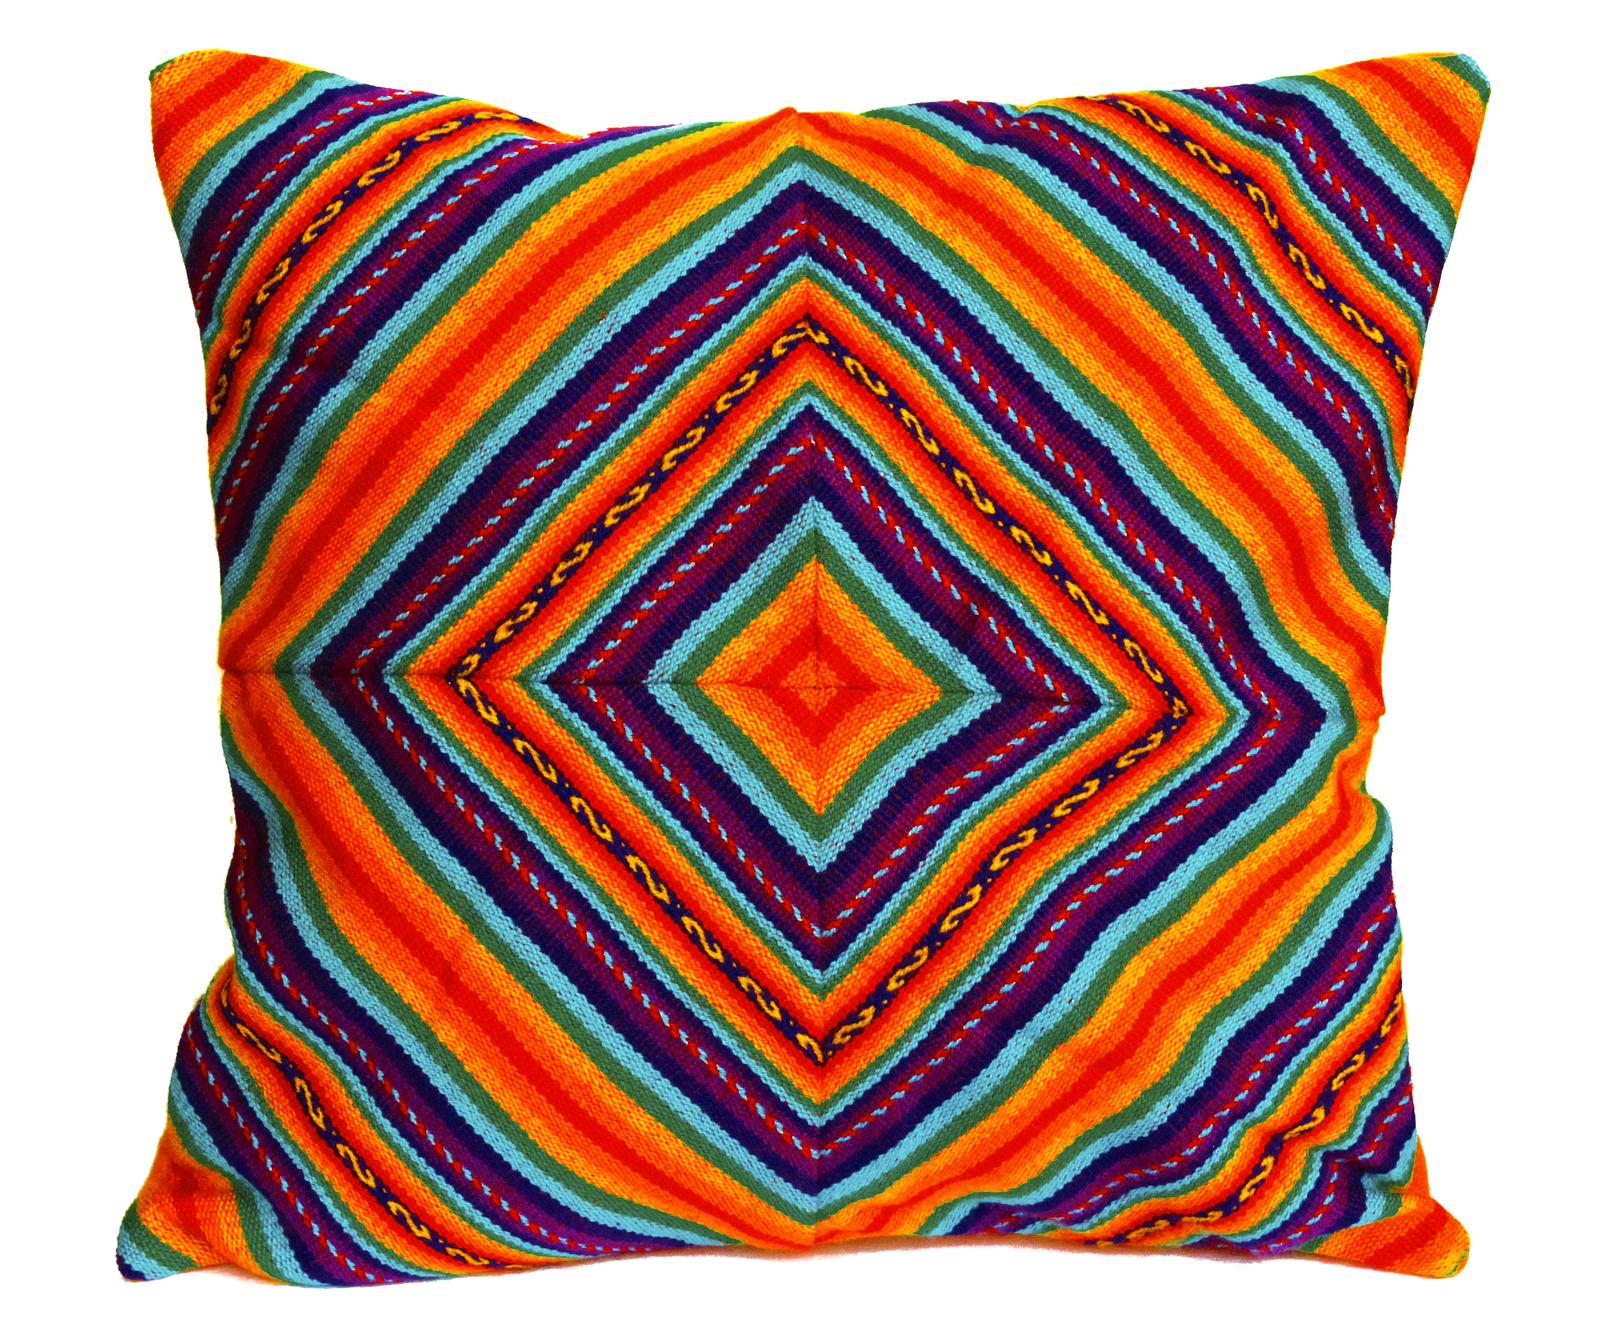 Rainbow PERUVIAN Cushion Cover, throw pillow, ethnic cushion, boho decor